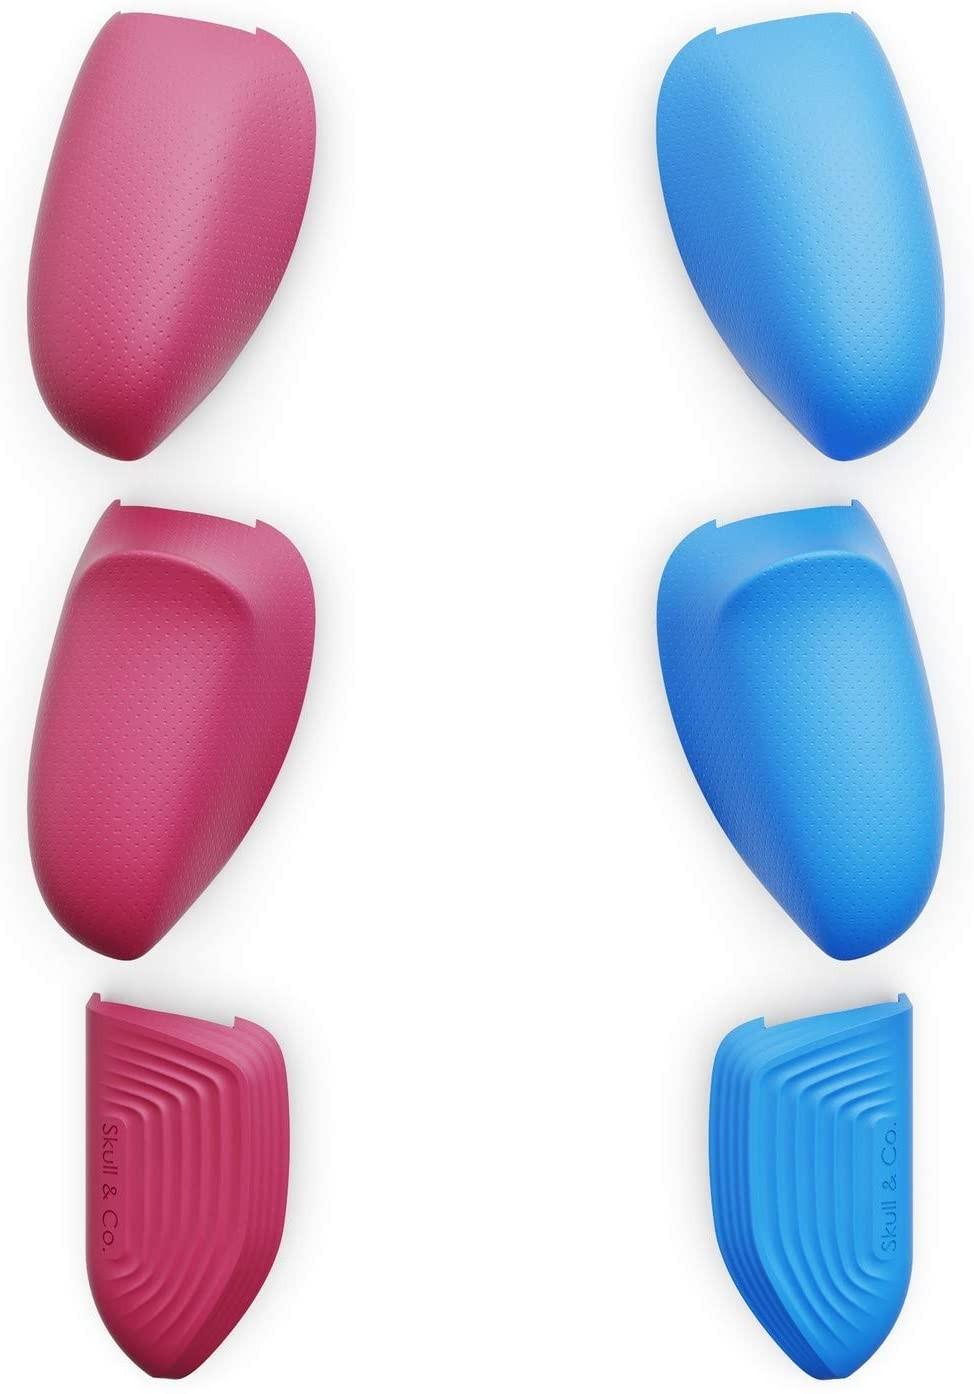 Змінні накладки-рукоятки Skull & Co. Interchangeable Lite Grip Set for GripCase Lite: Snap/Trigger/Plus Grips для SWITCH Lite Блакитний і Пурпурний Покемон